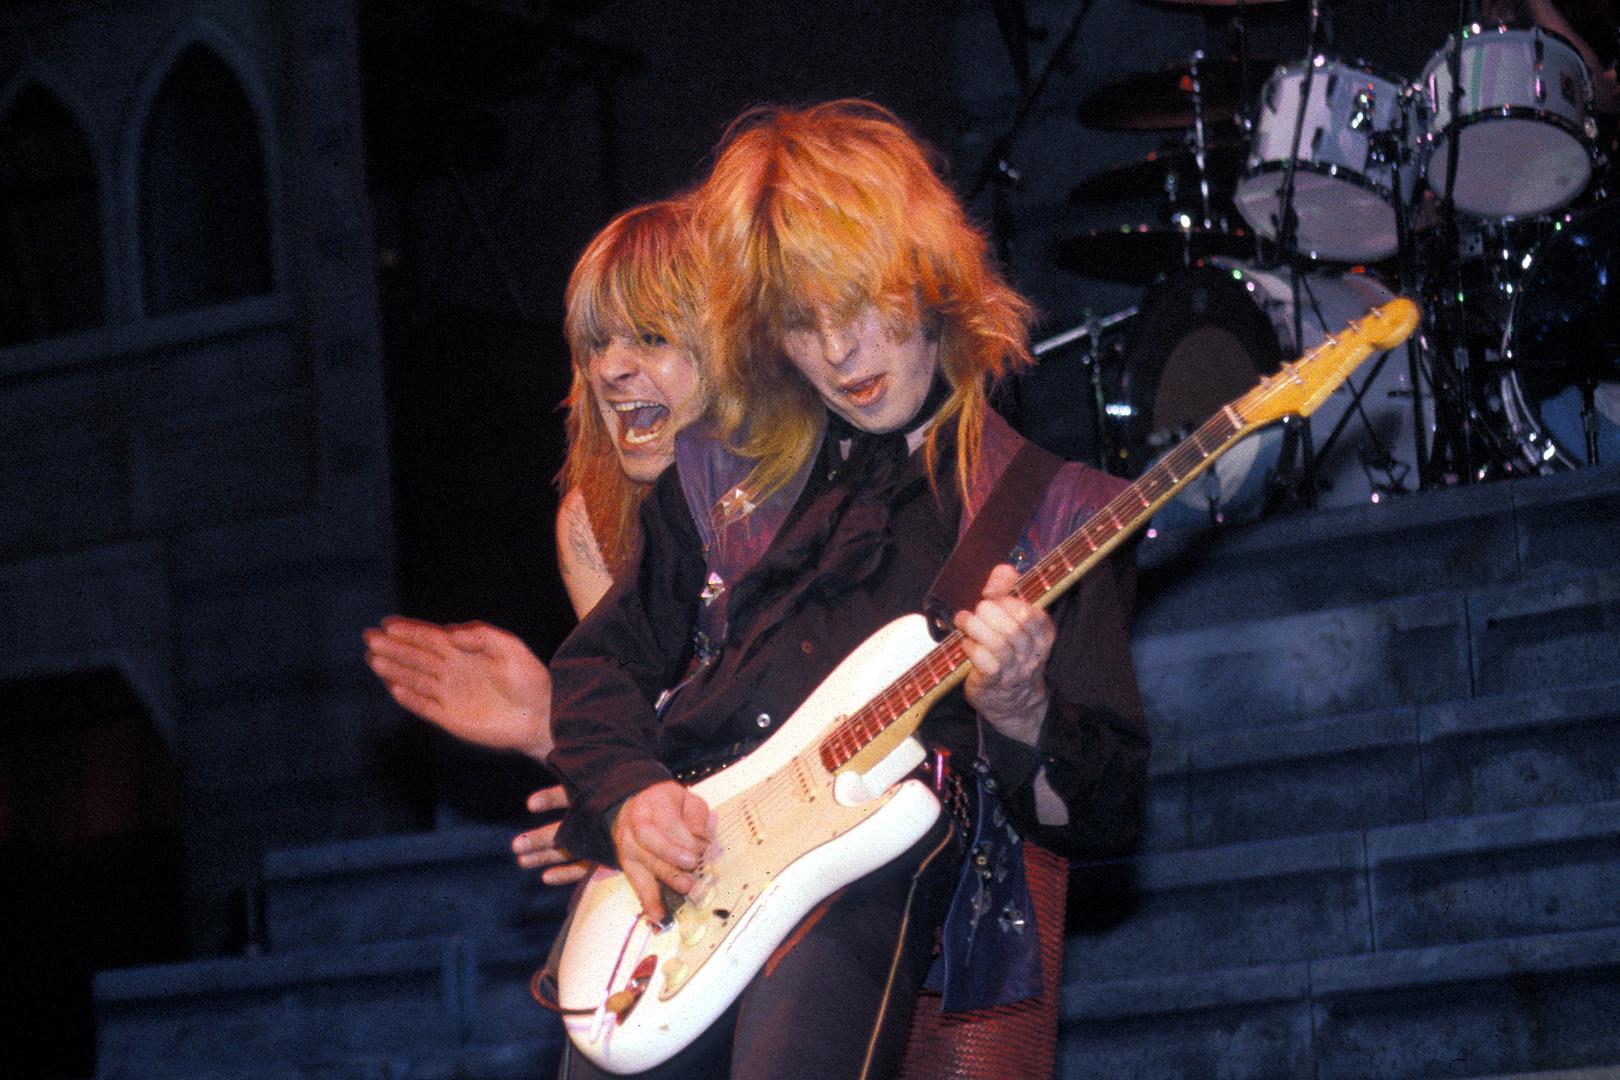 Former Ozzy Osbourne Guitarist Bernie Torme Dead at 66